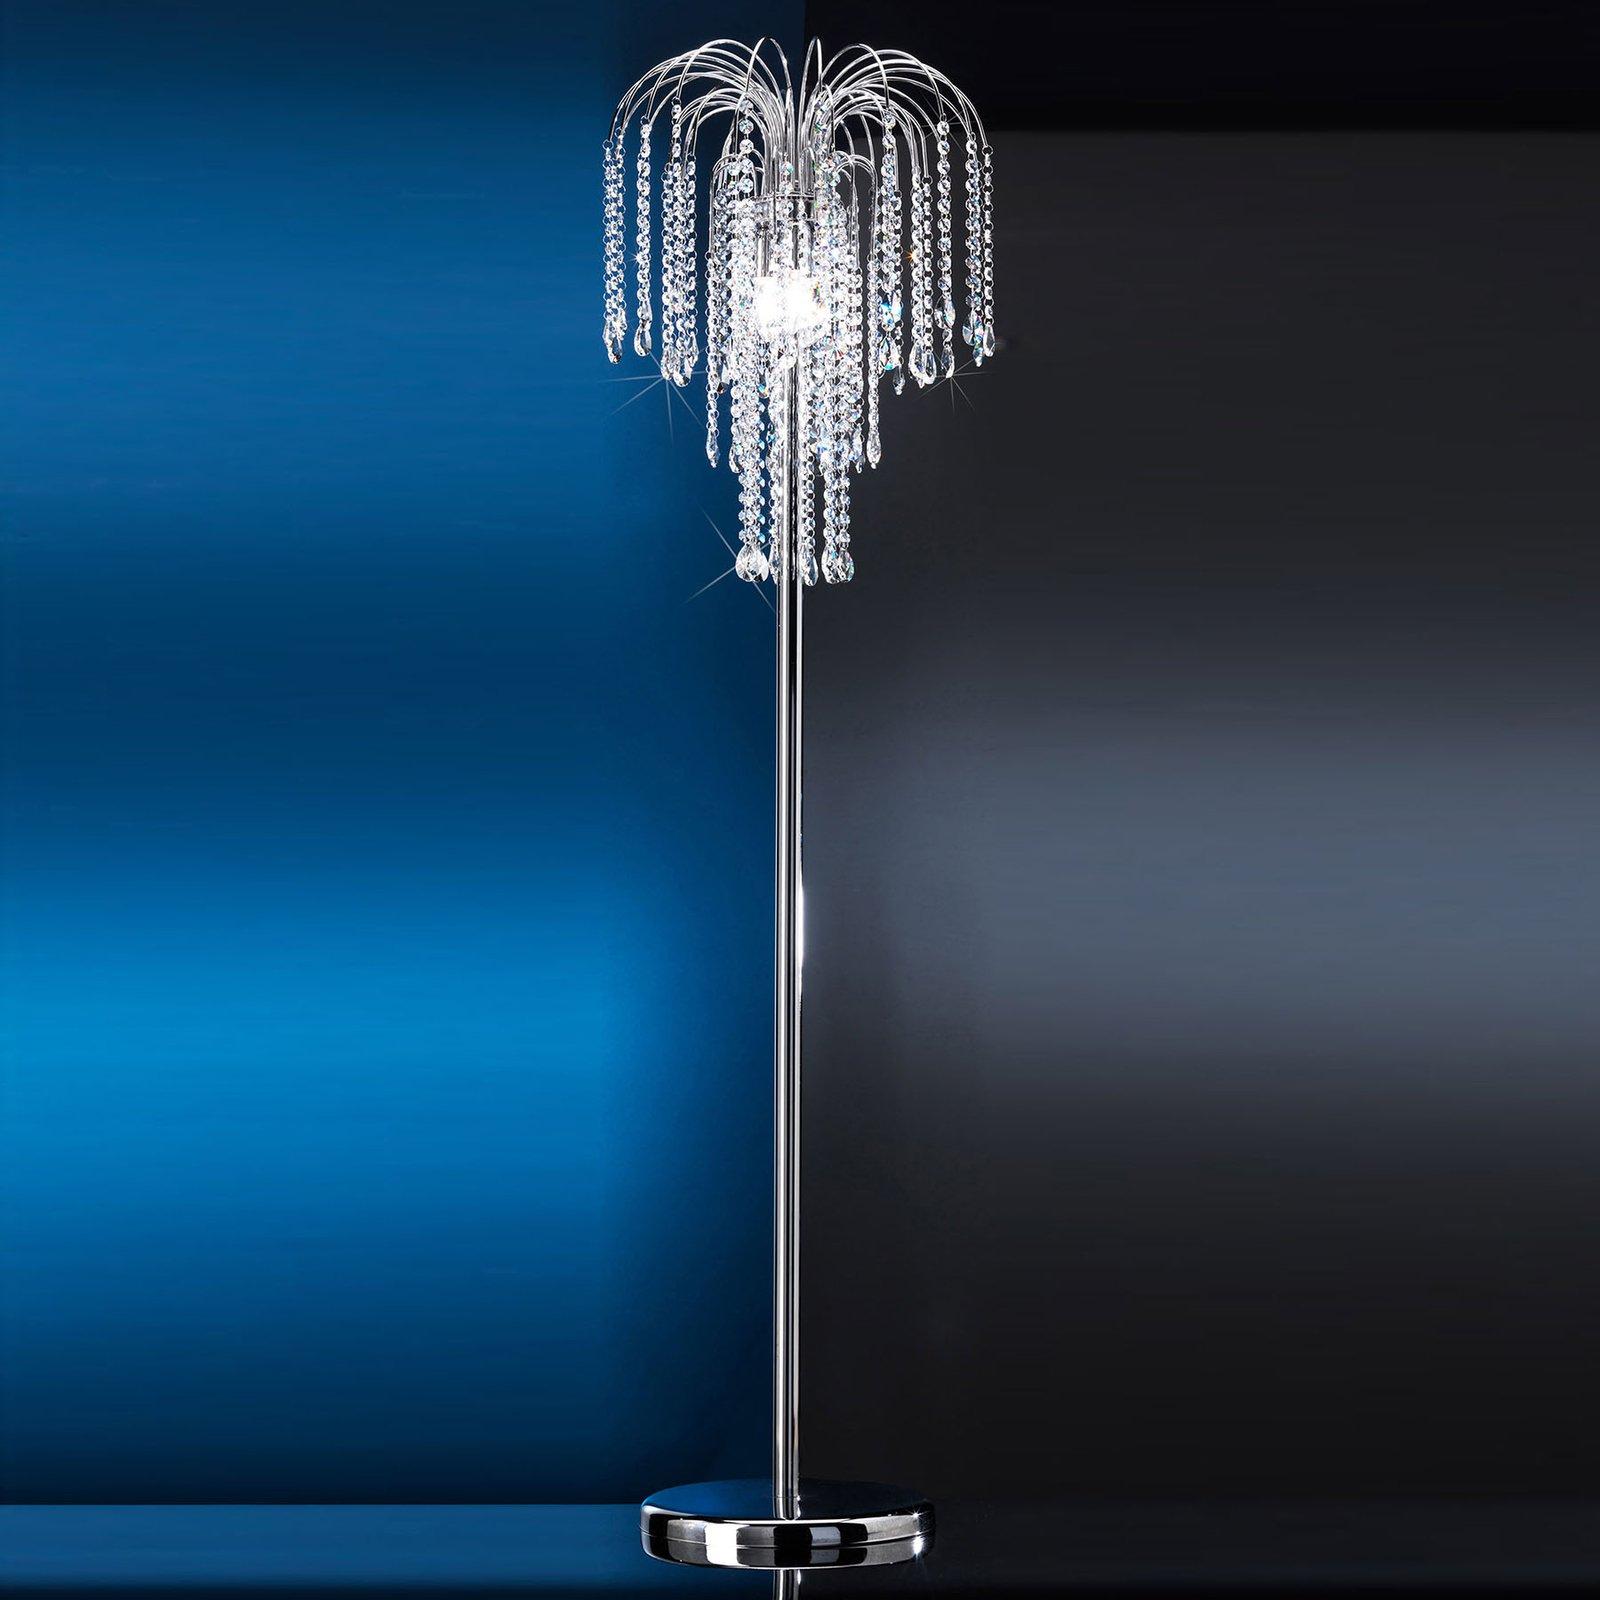 Gulvlampe Pioggia med krystallregn, krom